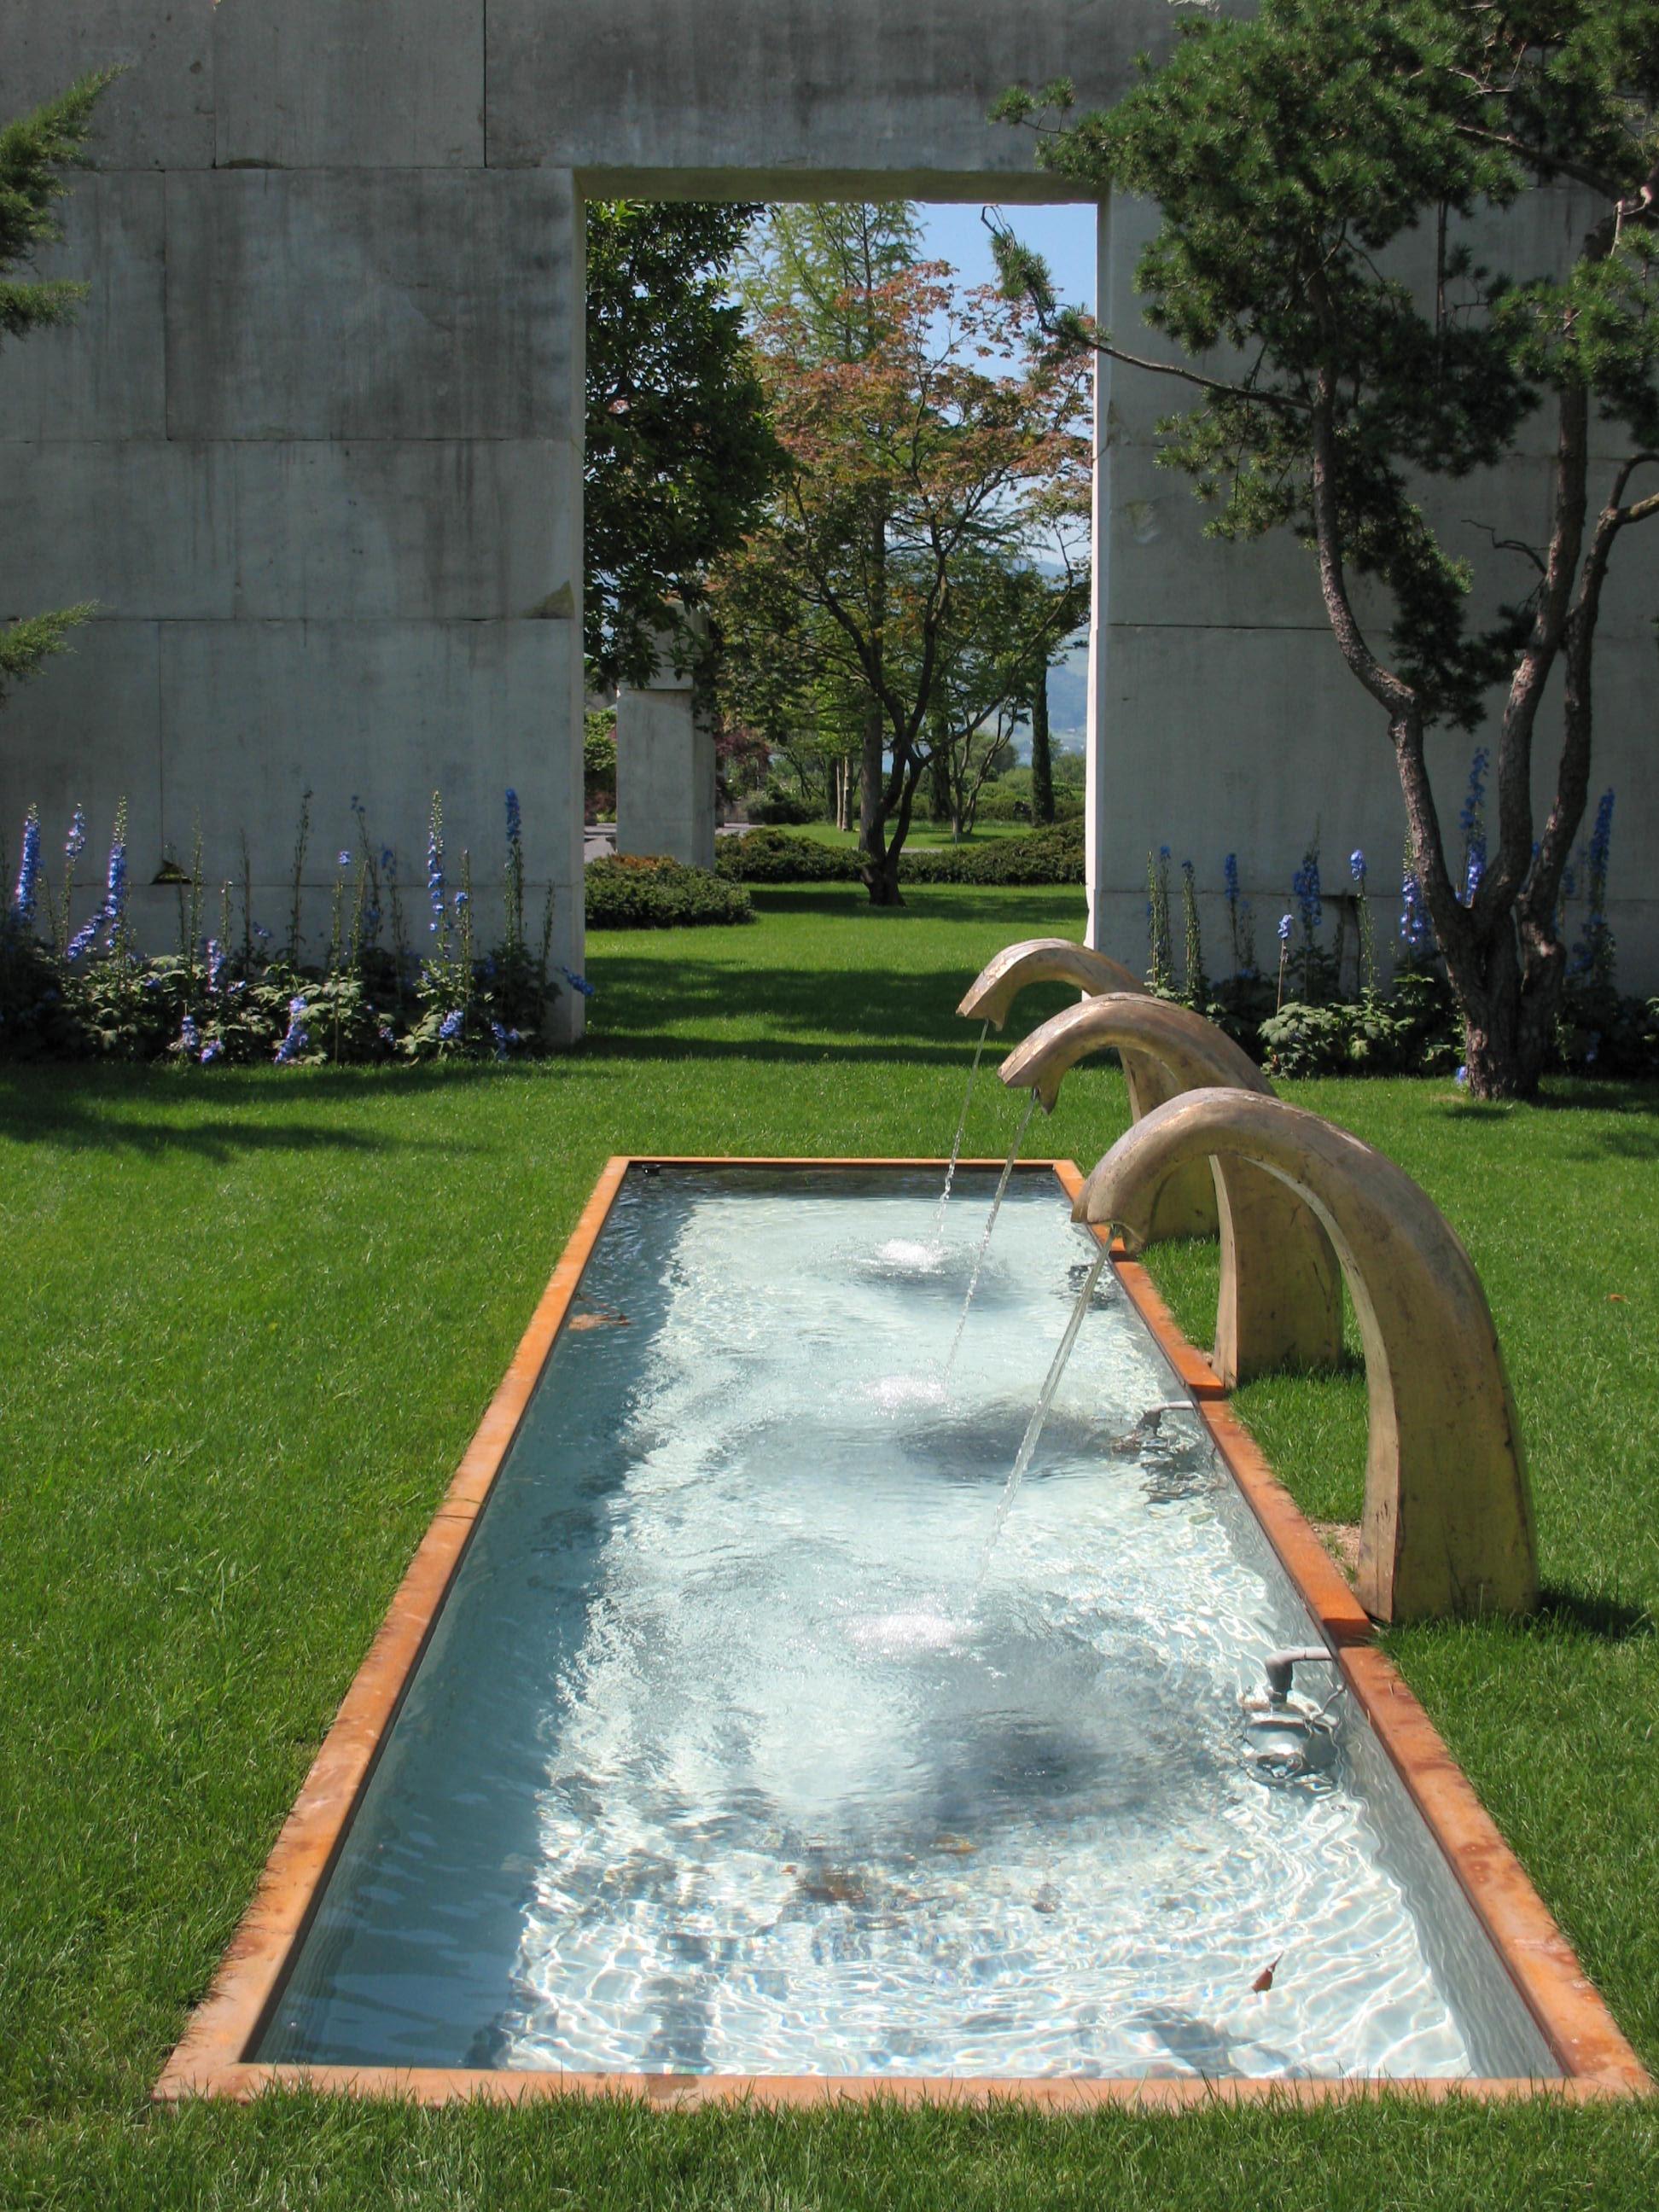 Backyard Architect Part - 38: Water Grass Lawn Swimming Pool Backyard Garden Leisure Art Estate Yard  Water Feature Reflecting Pool Rapperswil